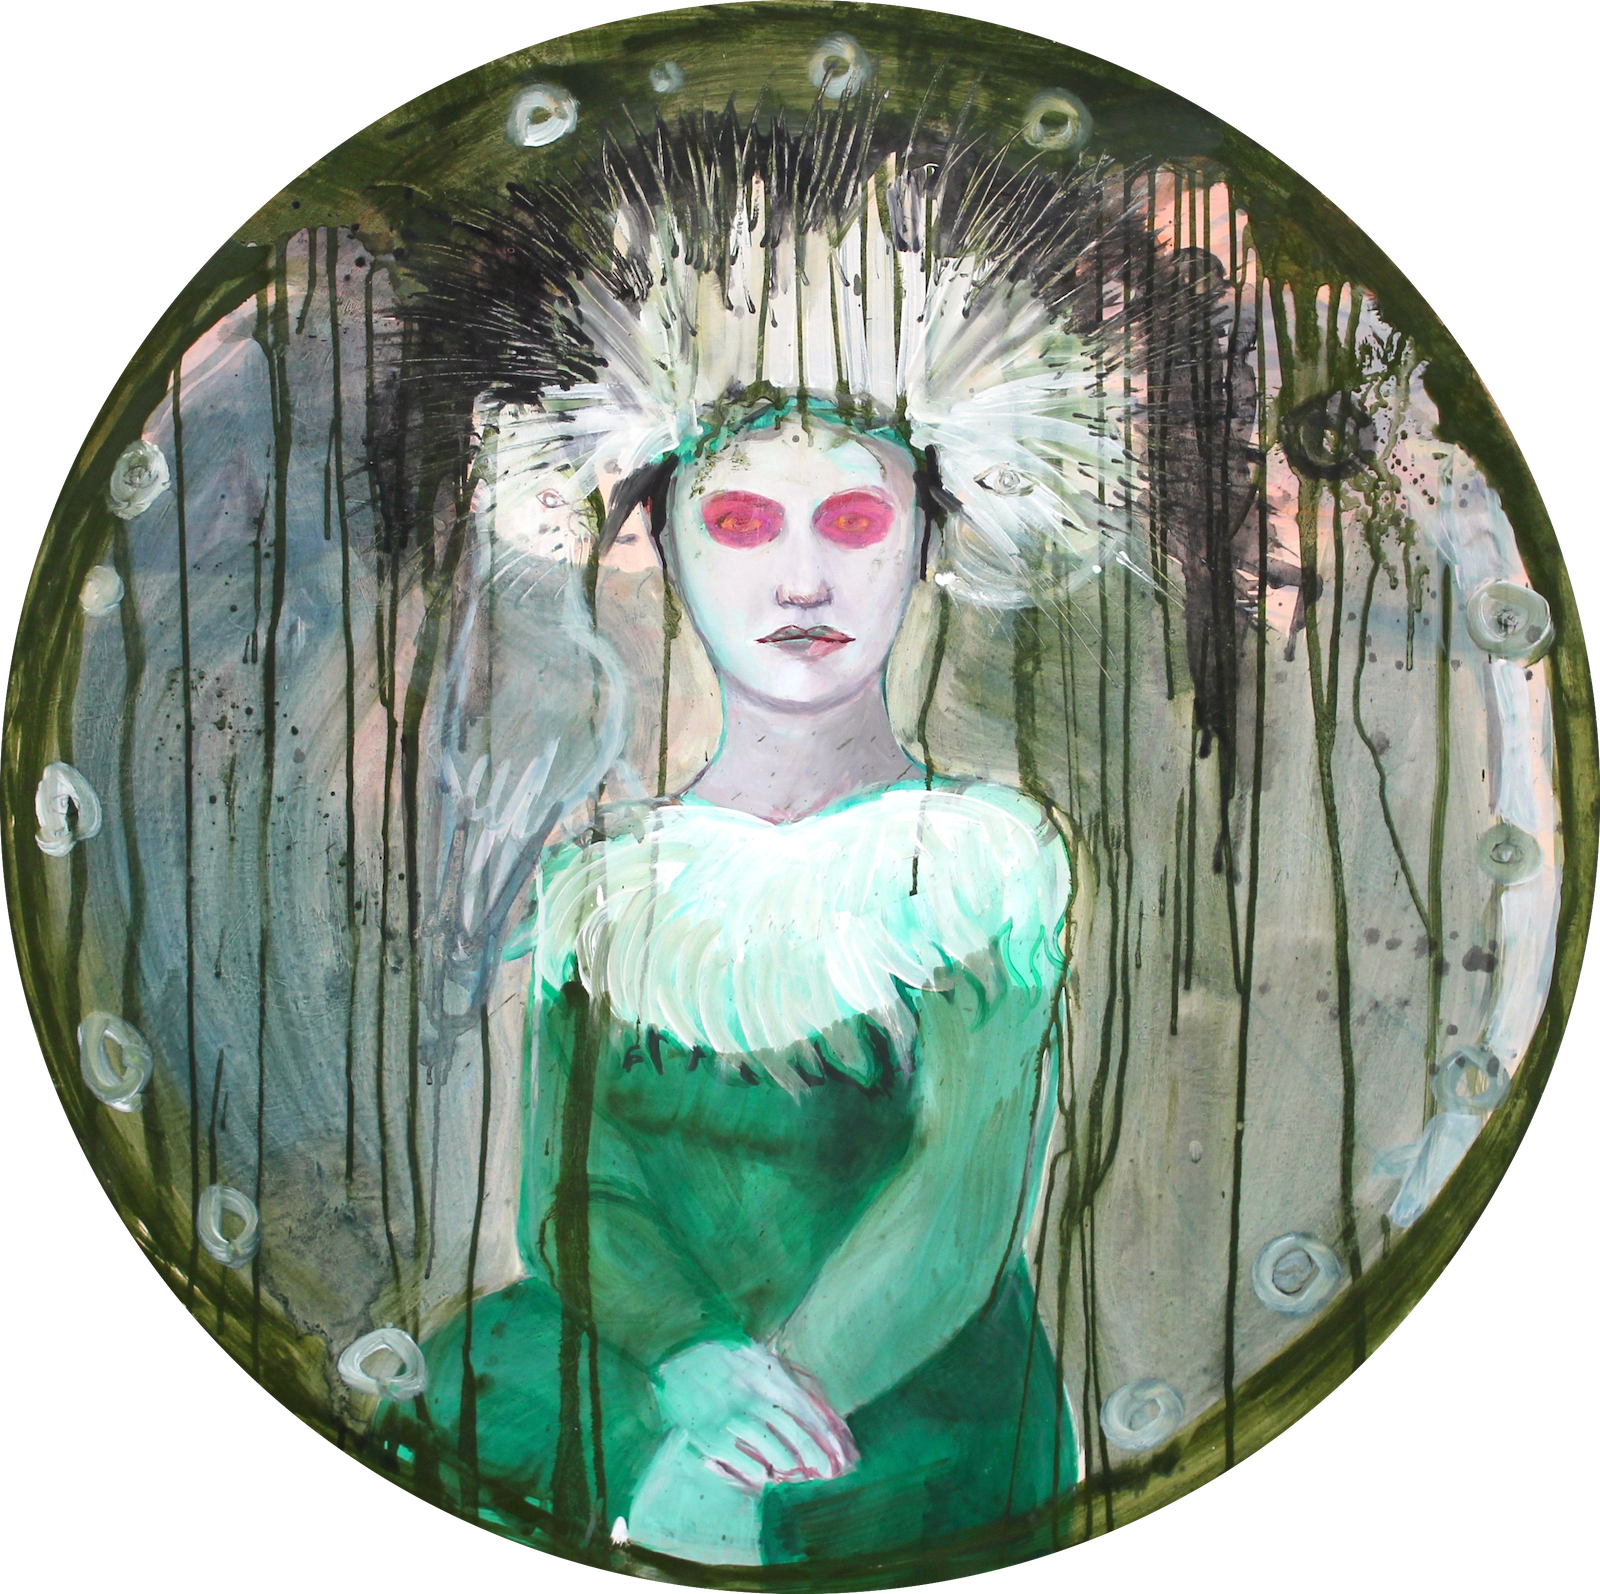 Ecce Draco: 2016 | Acryl & Eitempera auf Holz | Ø 88 cm